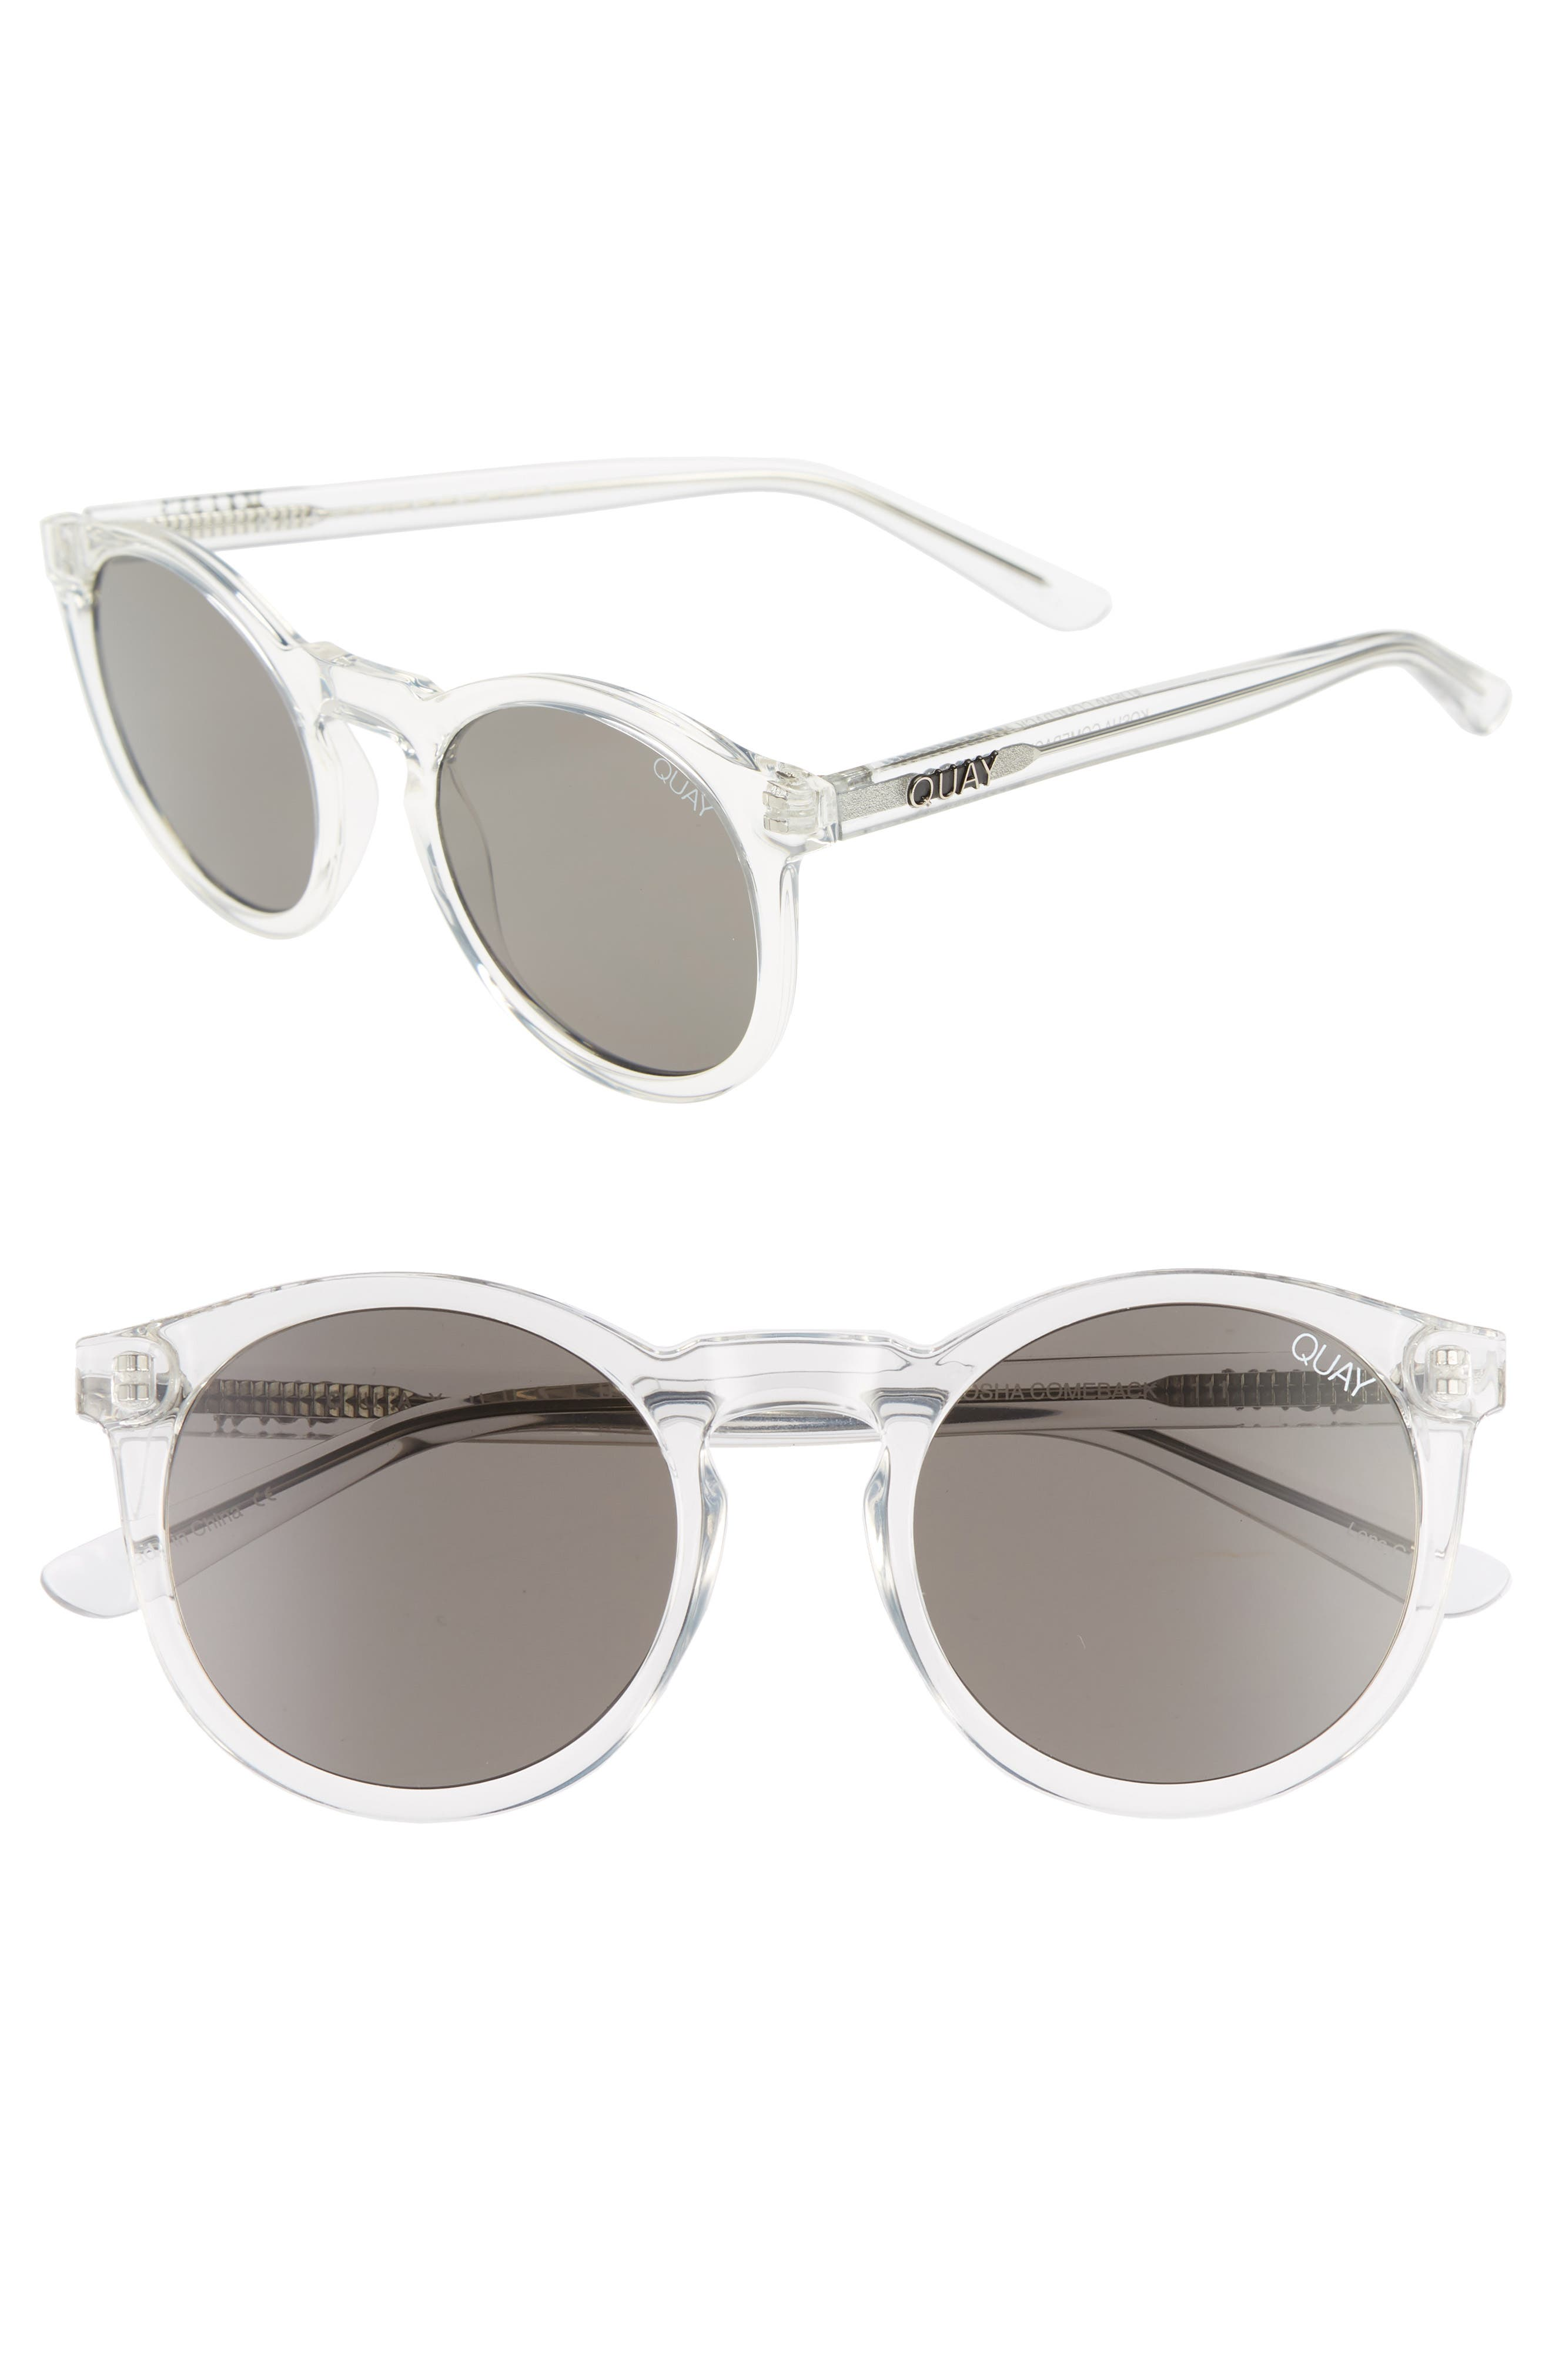 Kosha 49mm Round Sunglasses,                             Main thumbnail 1, color,                             Clear/ Smoke